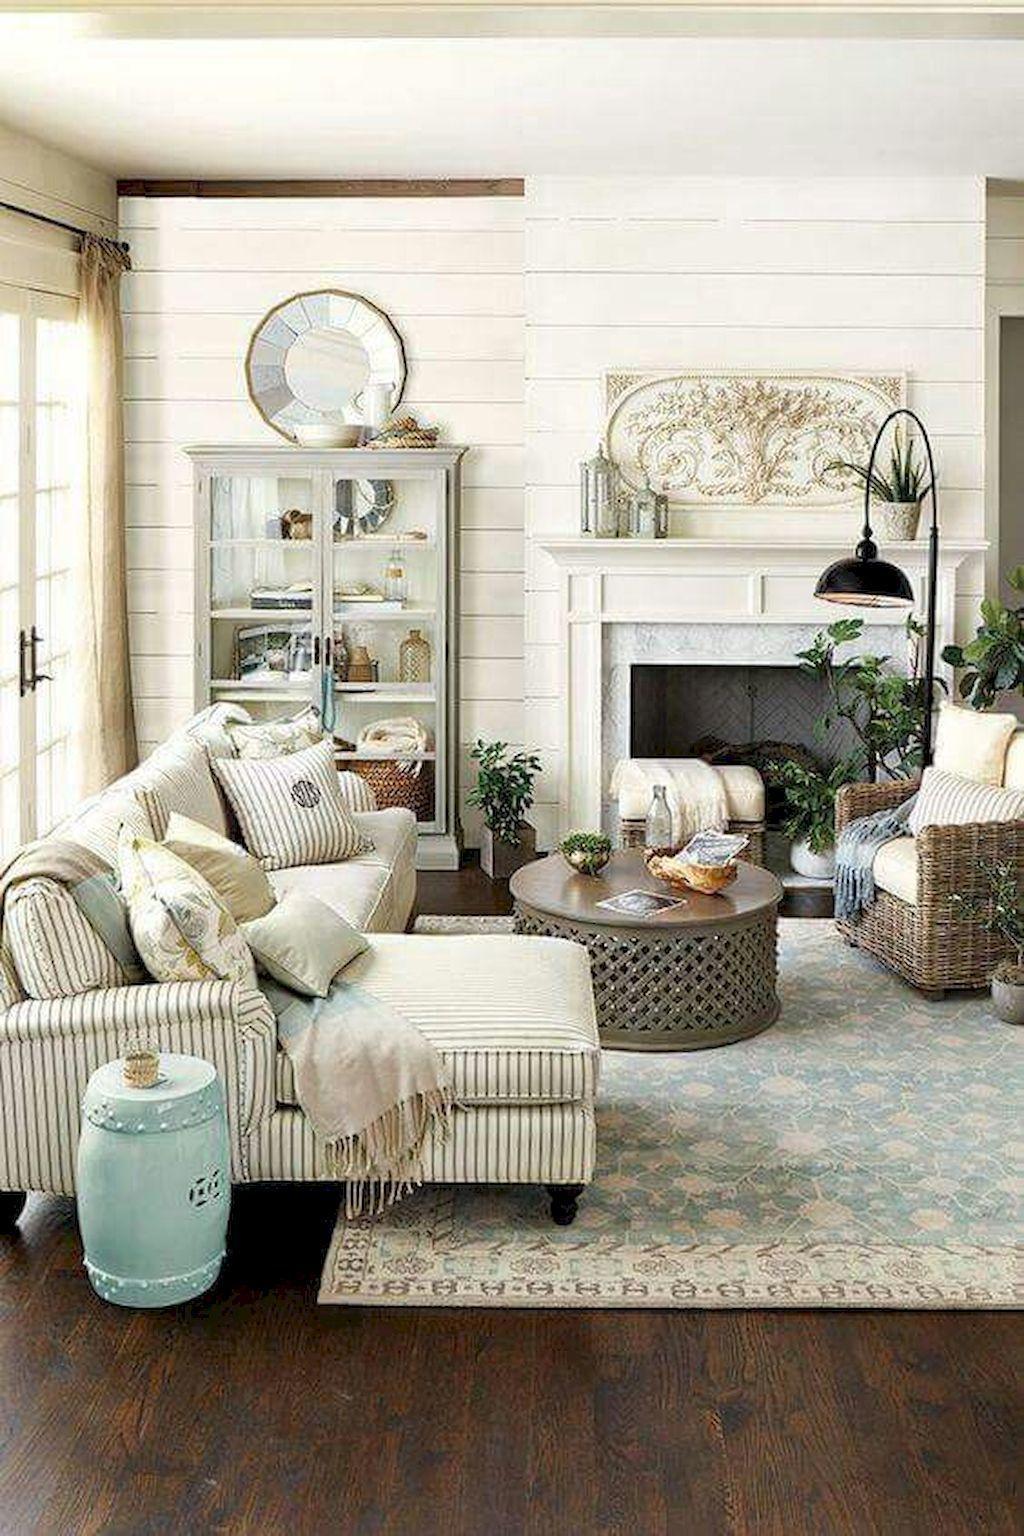 Vintage small living room decorating ideas (2) | Design | Pinterest ...